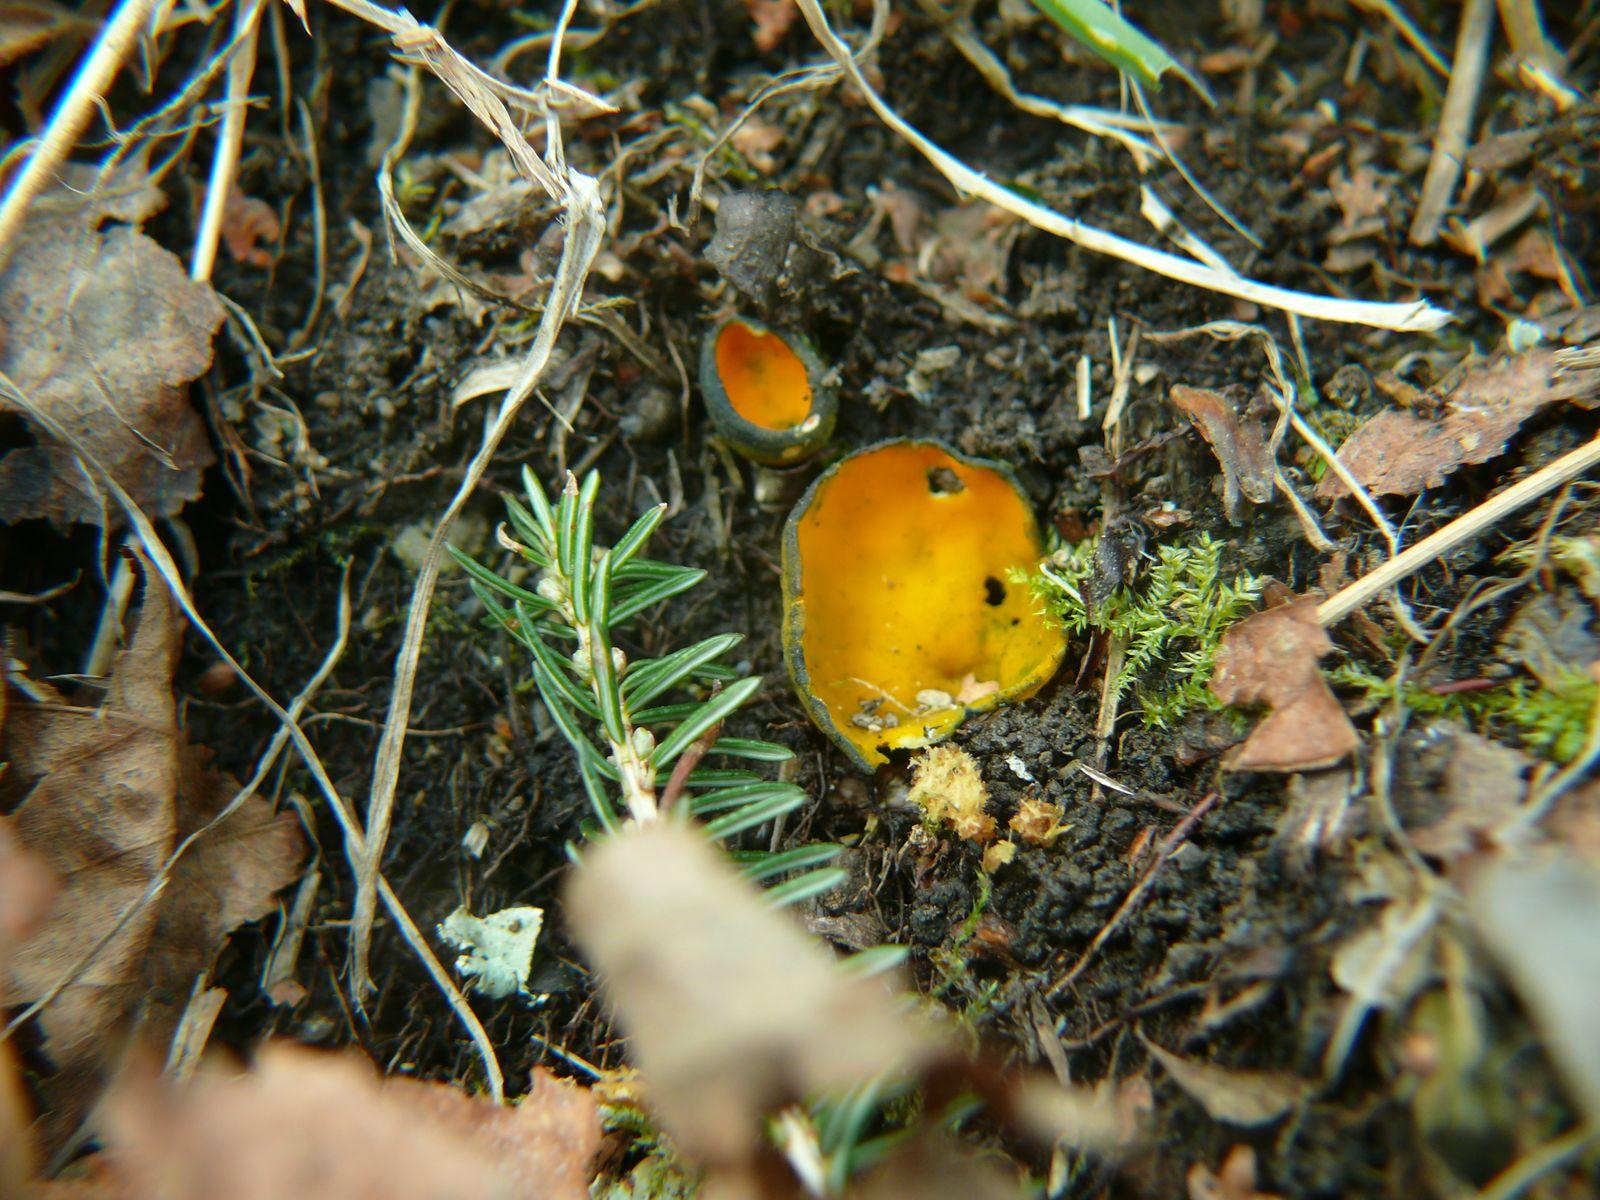 Sortie mycologique - Caloscypha Fulgens © Association mycologique de Bigorre